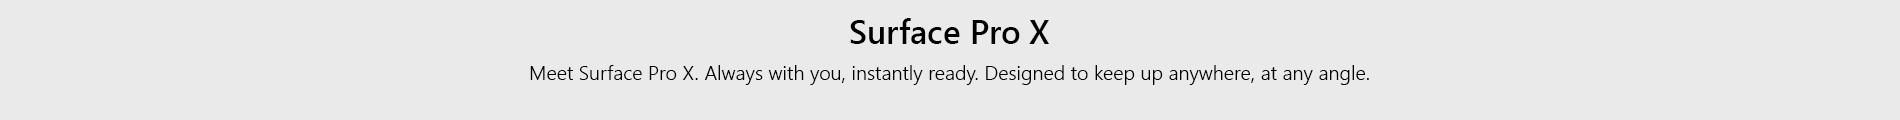 Microsoft Surface Header Landing Page 09.27.21 Tile 01